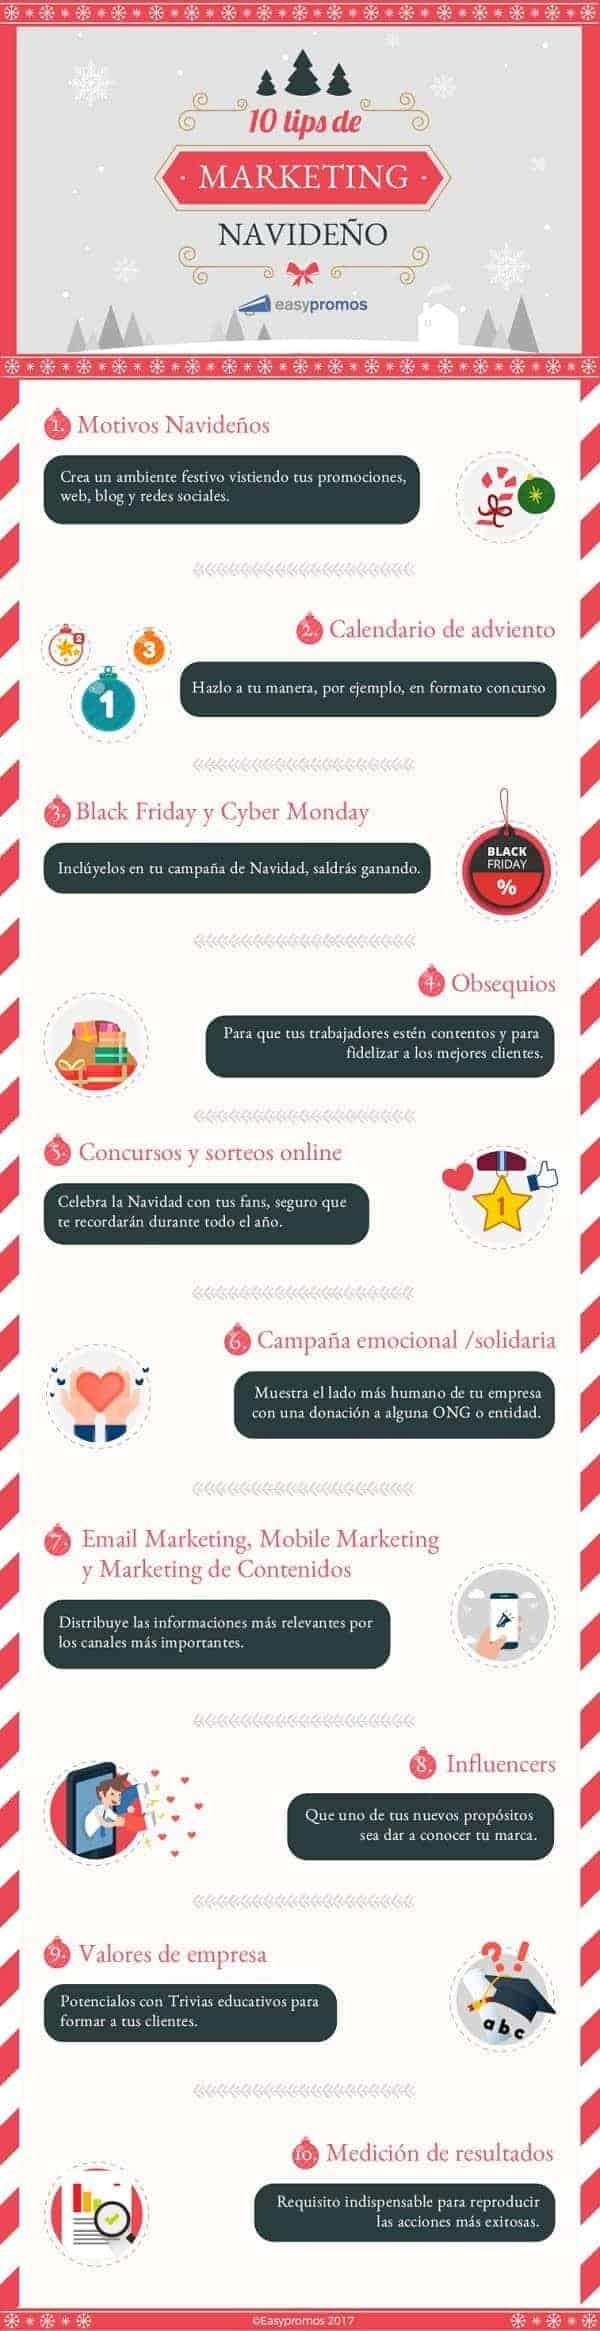 vender-redes-sociales-navidad-infografia